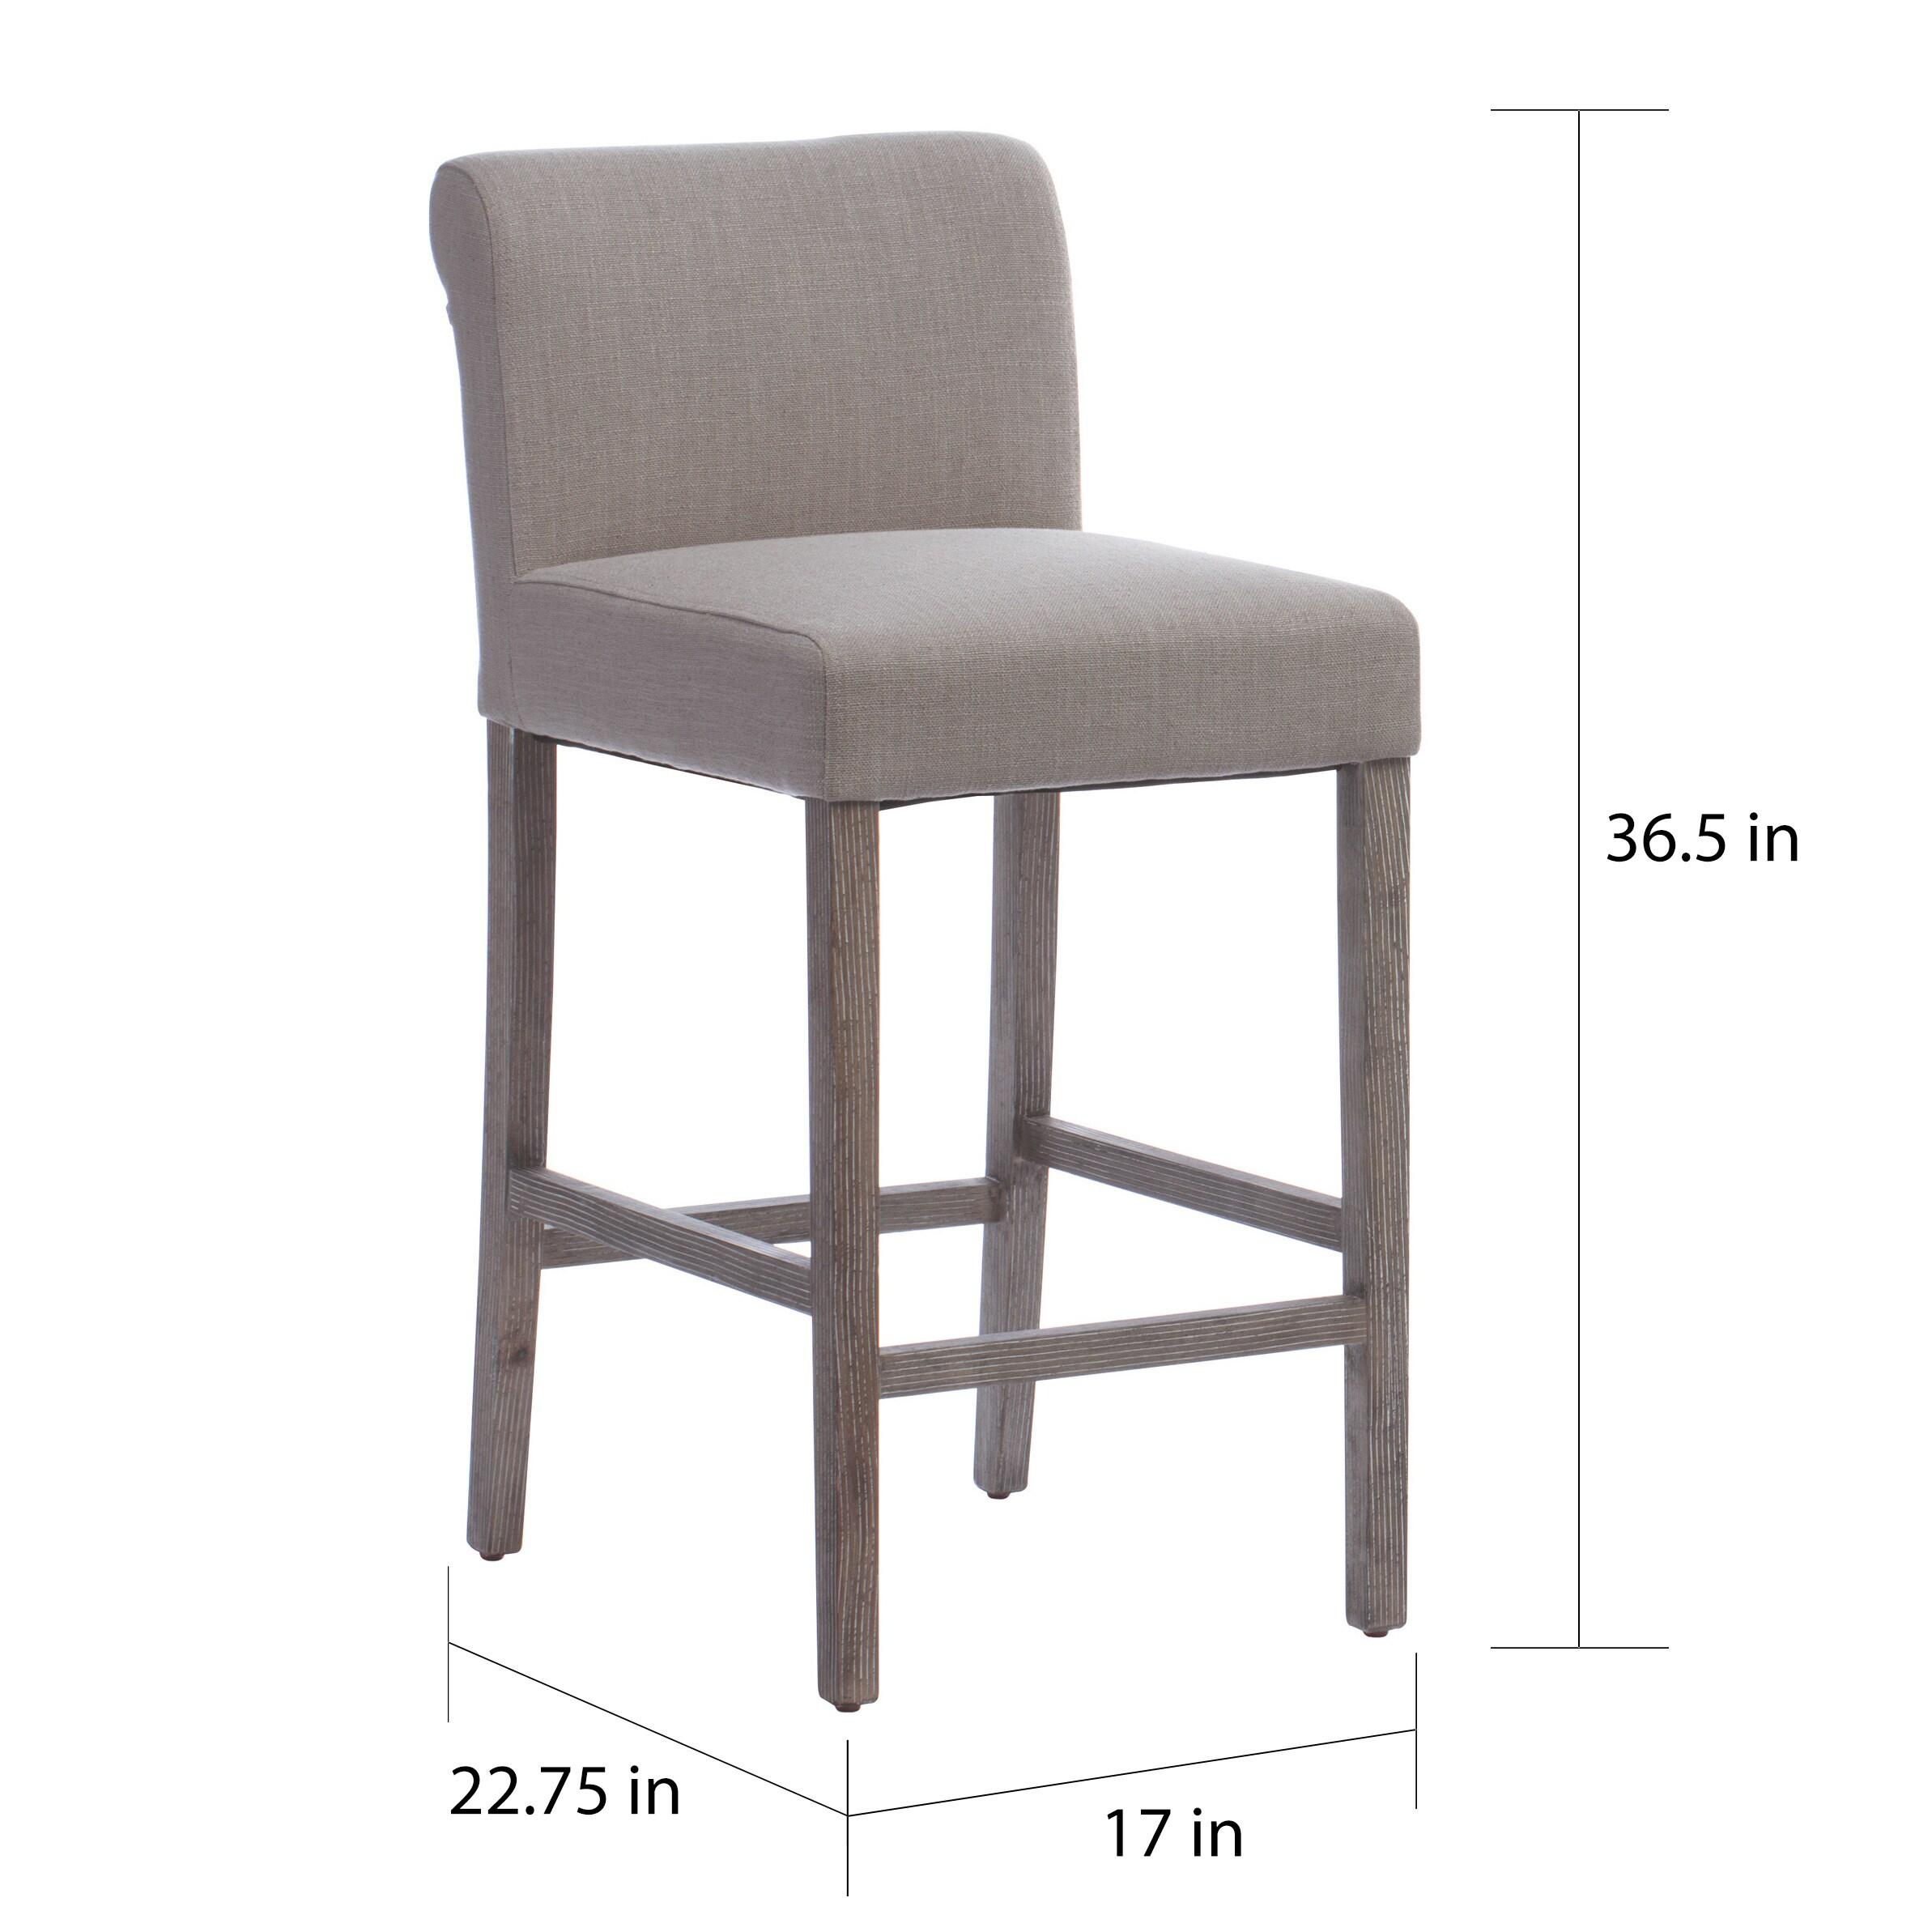 beige bar stools. Shop Jasper Laine Cosmopolitan Beige Linen Counter Stools (Set Of 2) - Free Shipping Today Overstock.com 8682591 Bar A